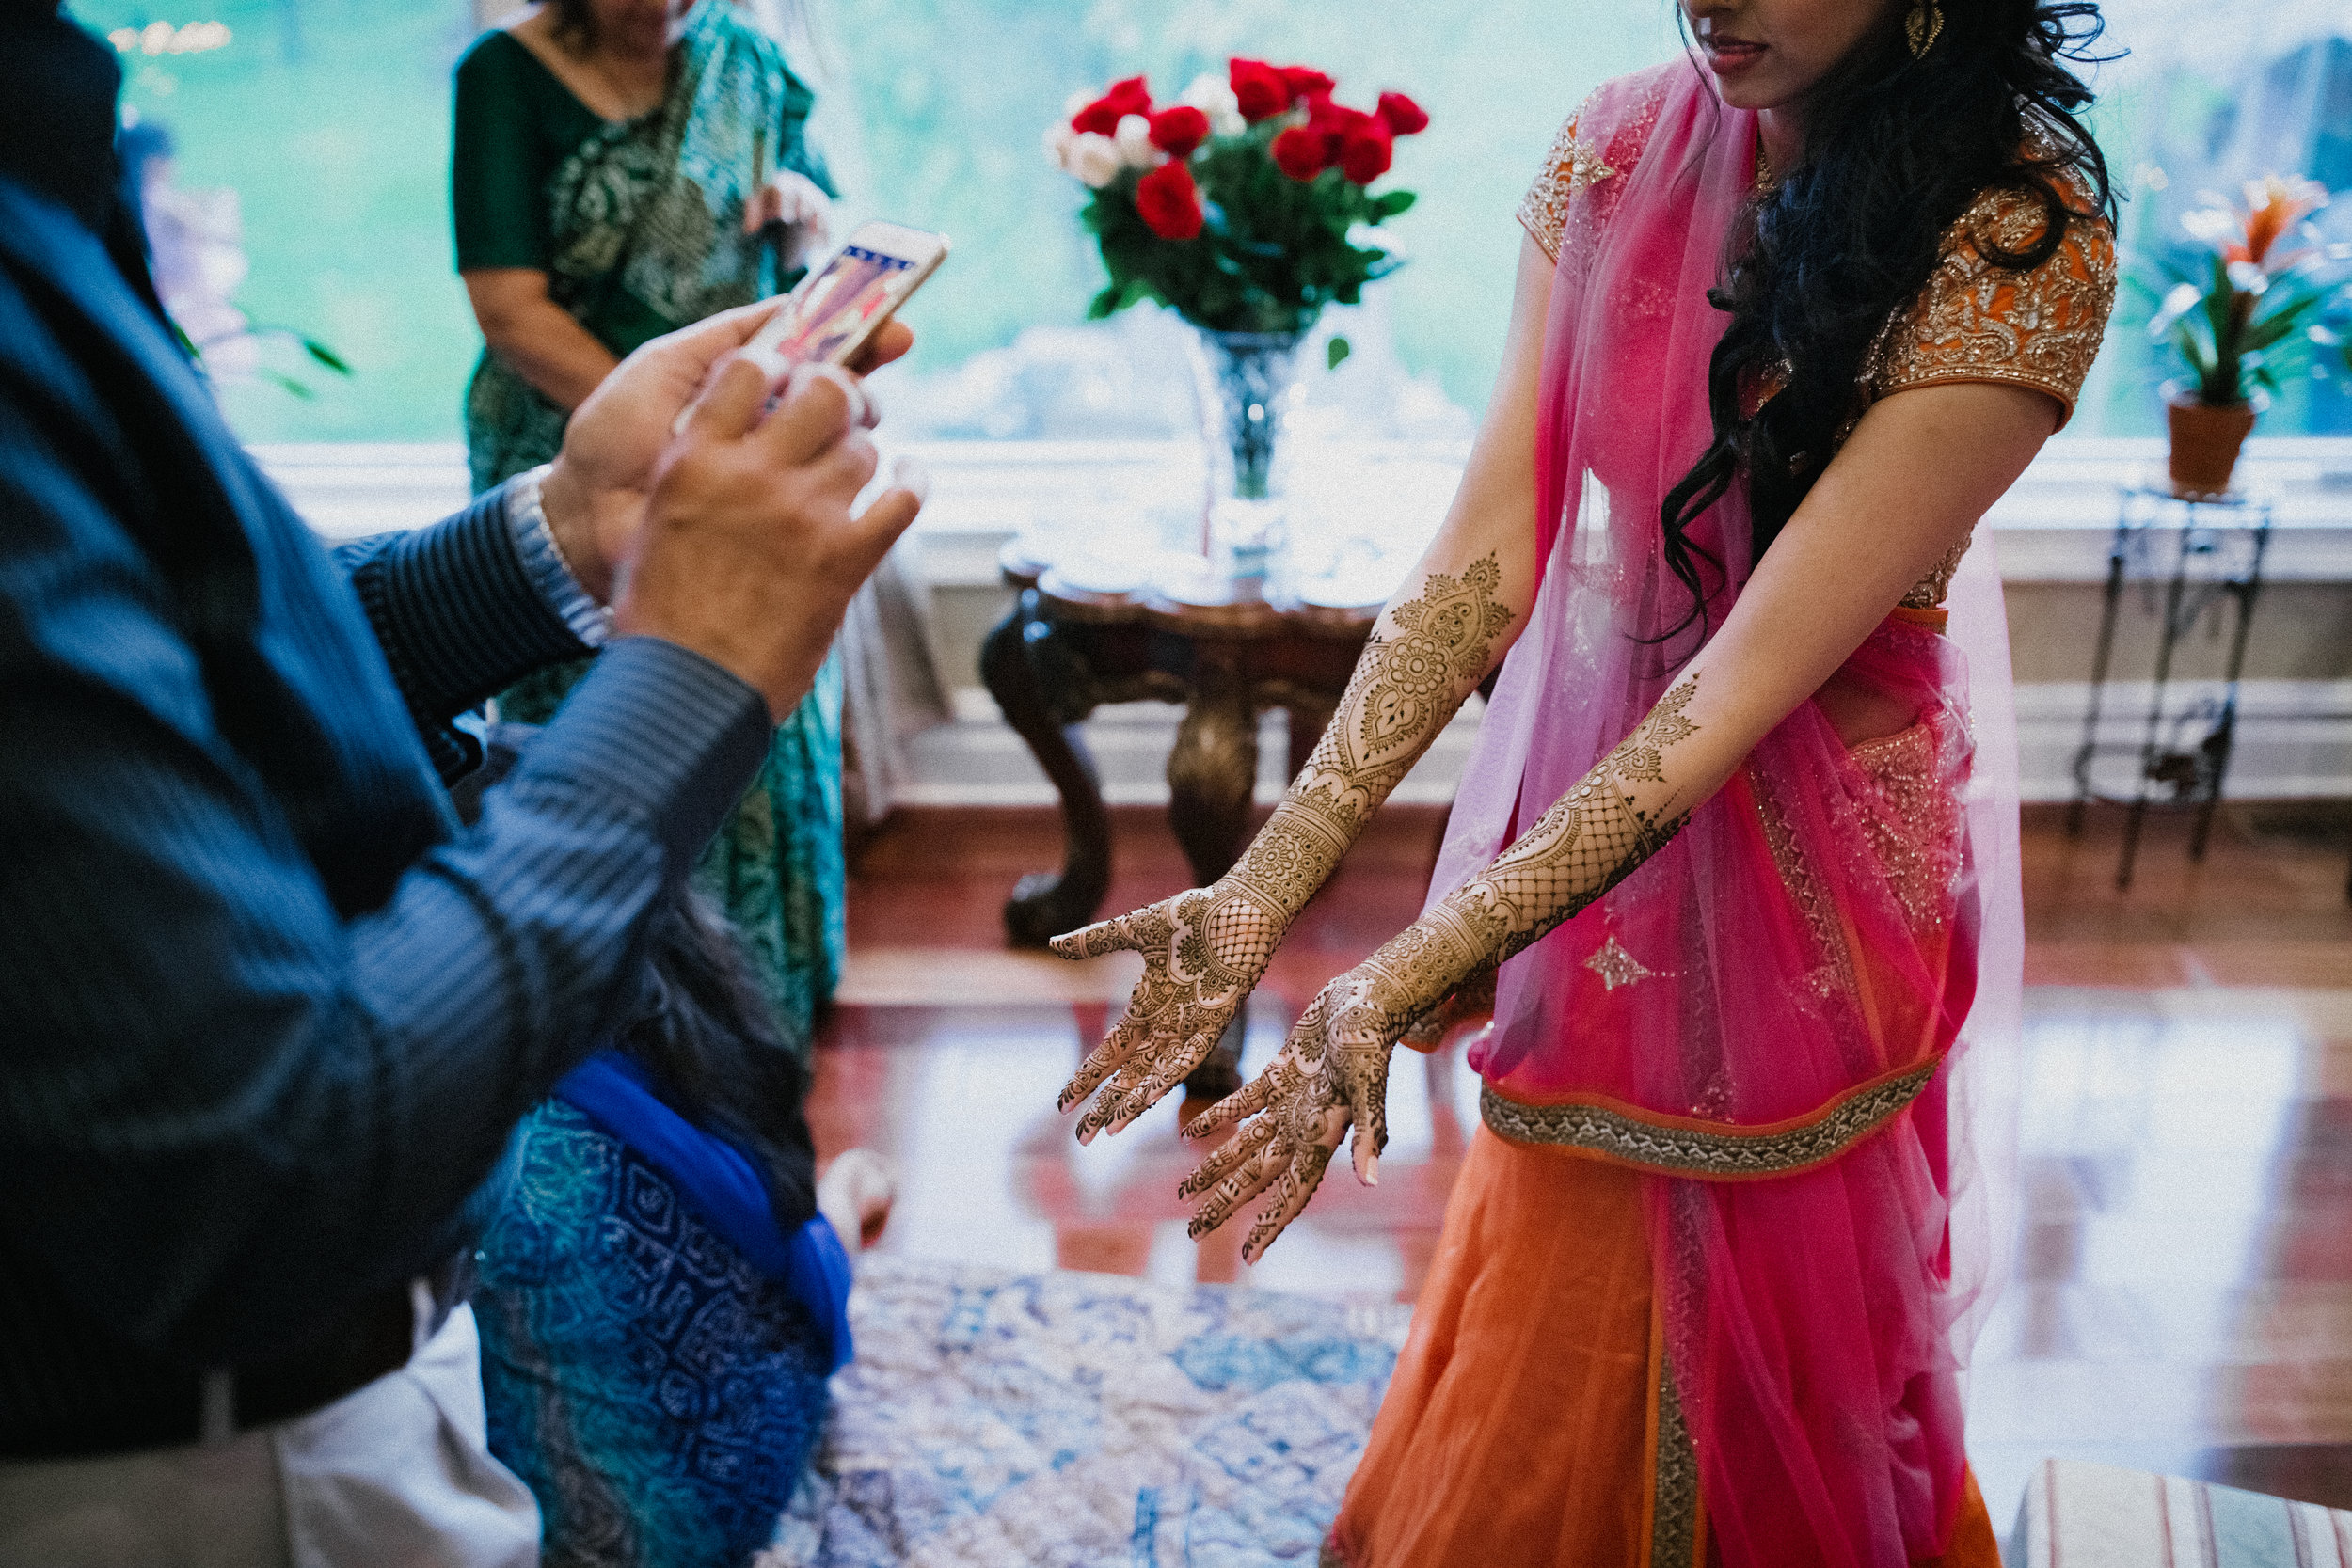 Aparna-Ankit-Patel-Mehndi-Wedding-Photos-0067.jpg